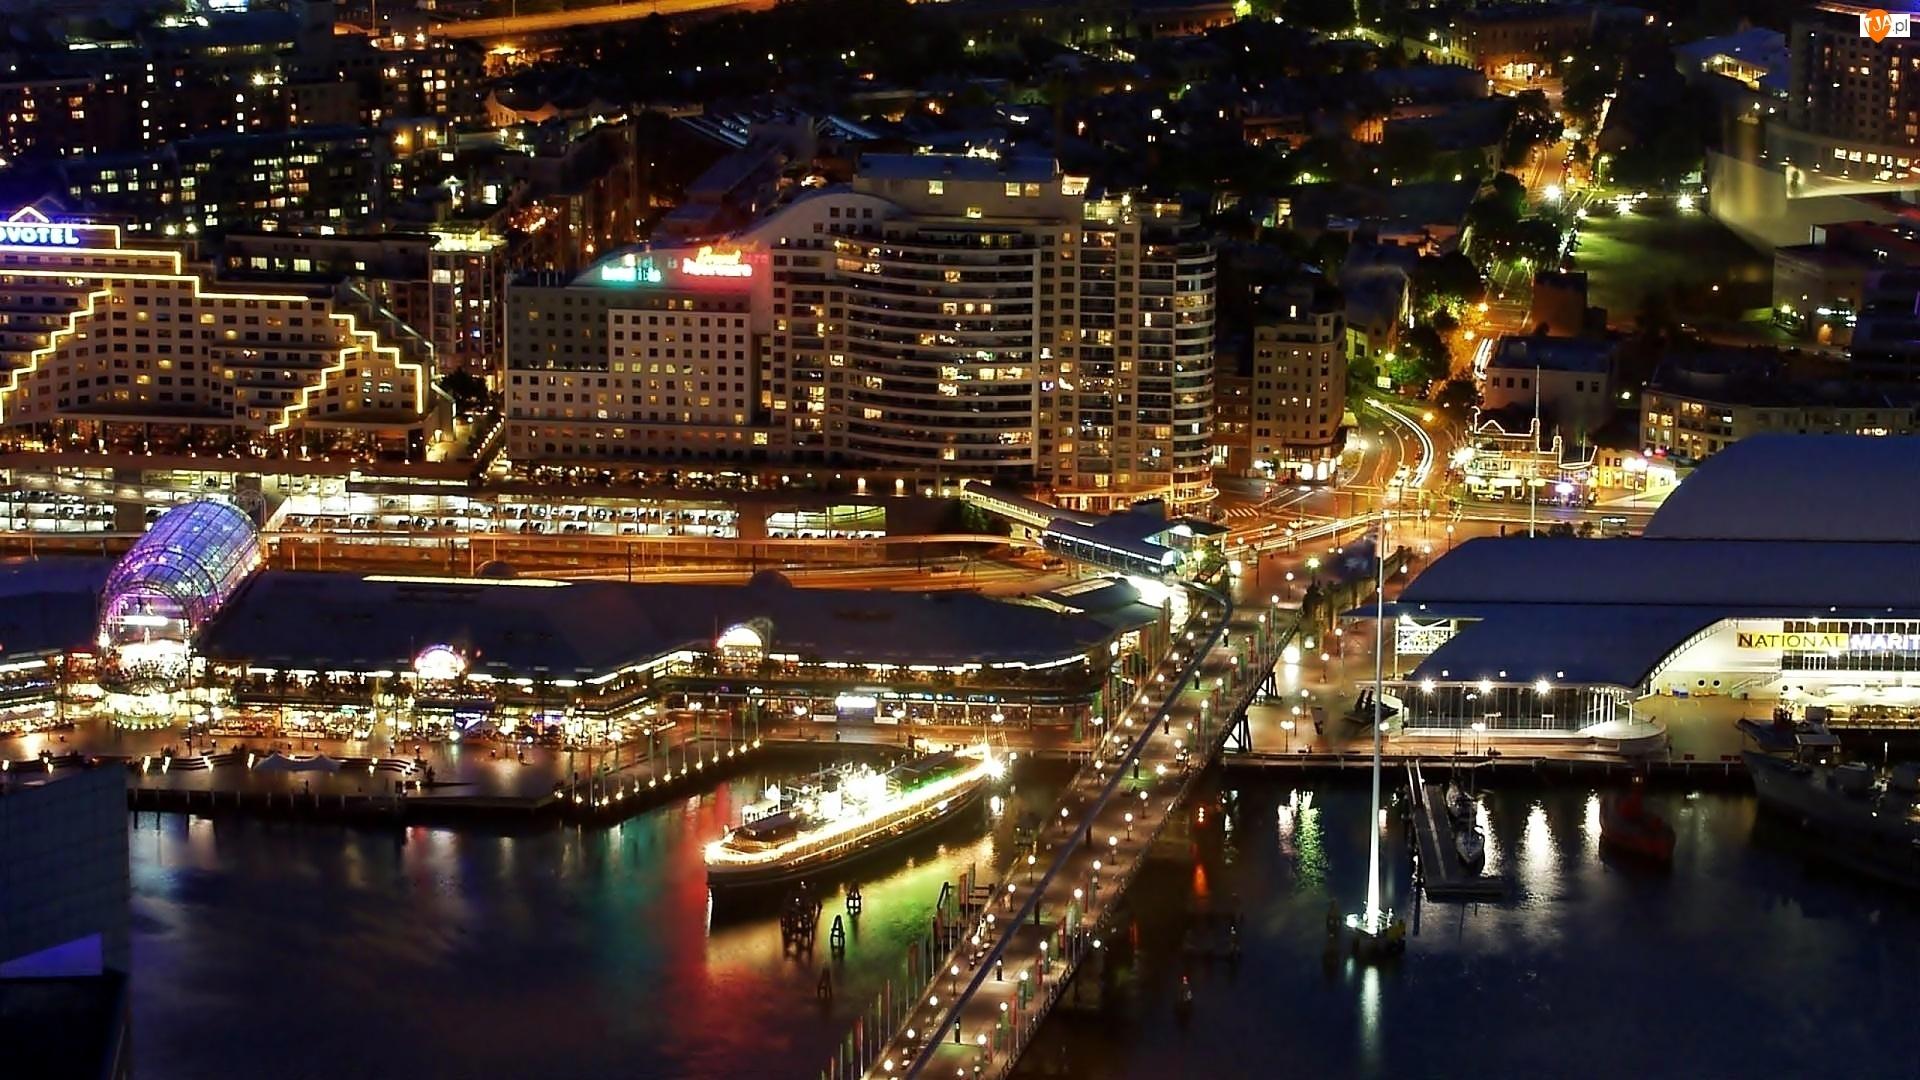 Harbour, Most, Port, Nocą, Chmur, Miasta, Drapacze, Fragment, Statek, Sydney